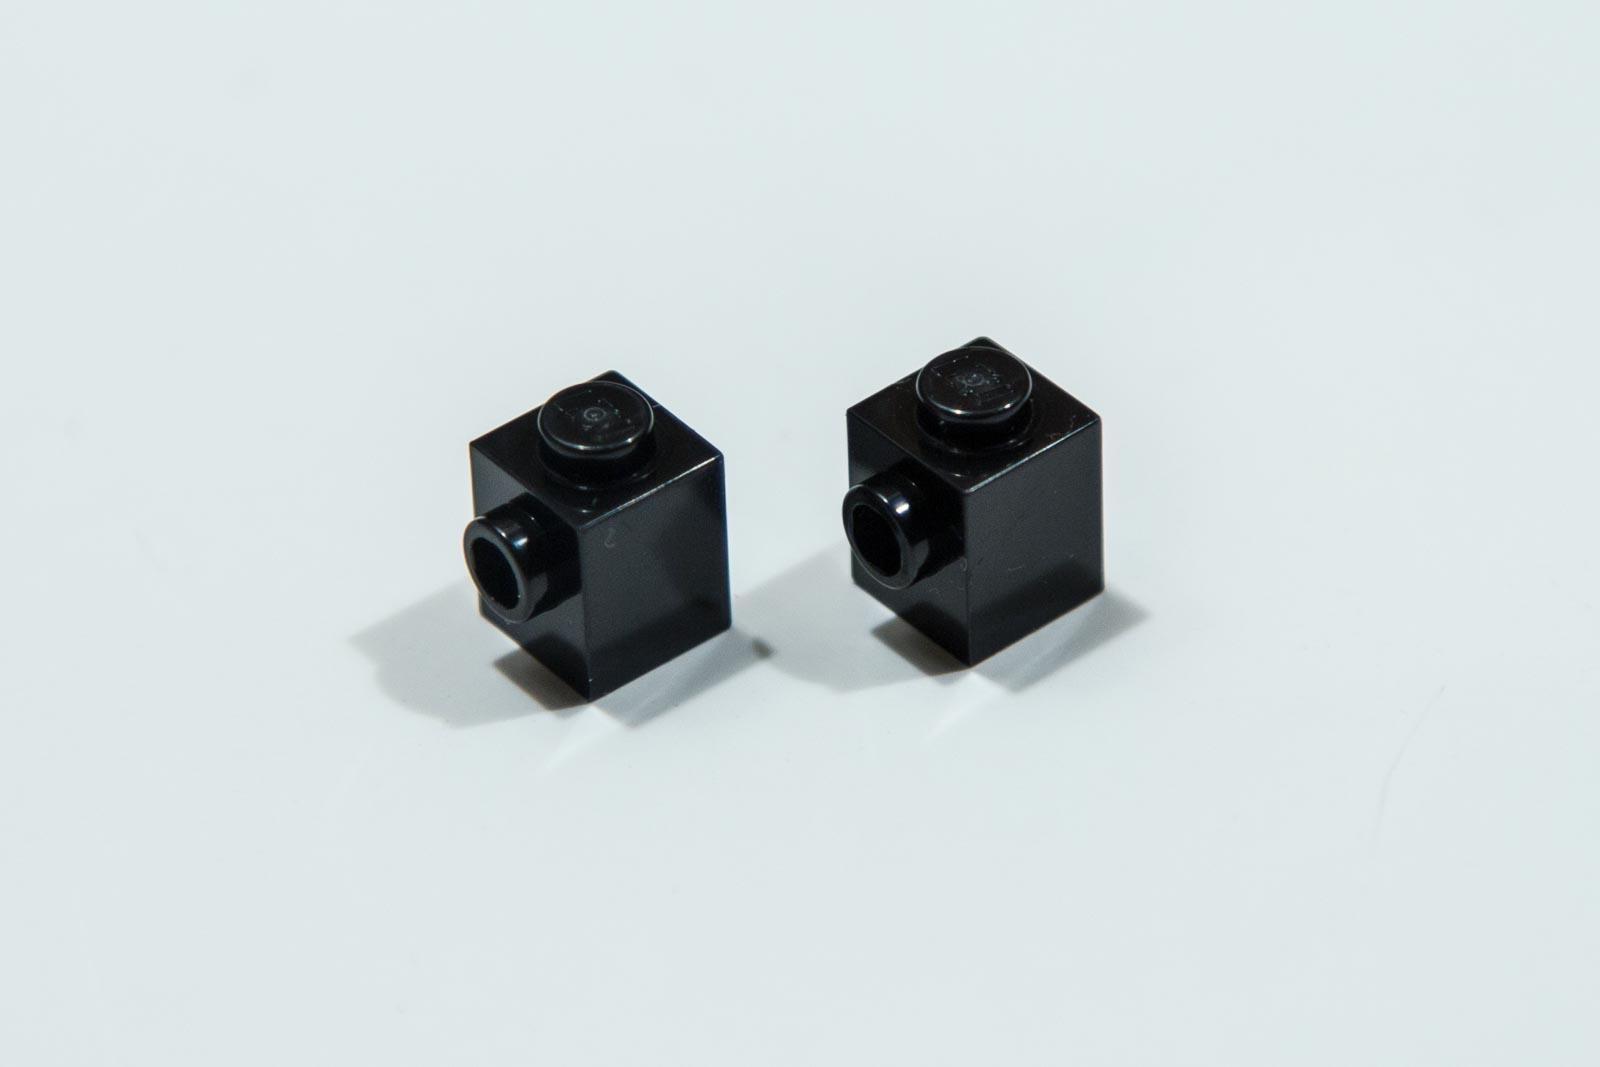 NEW Lego 87087 1×1 2x Brick With 1 Knob 4558954 | Mad ...